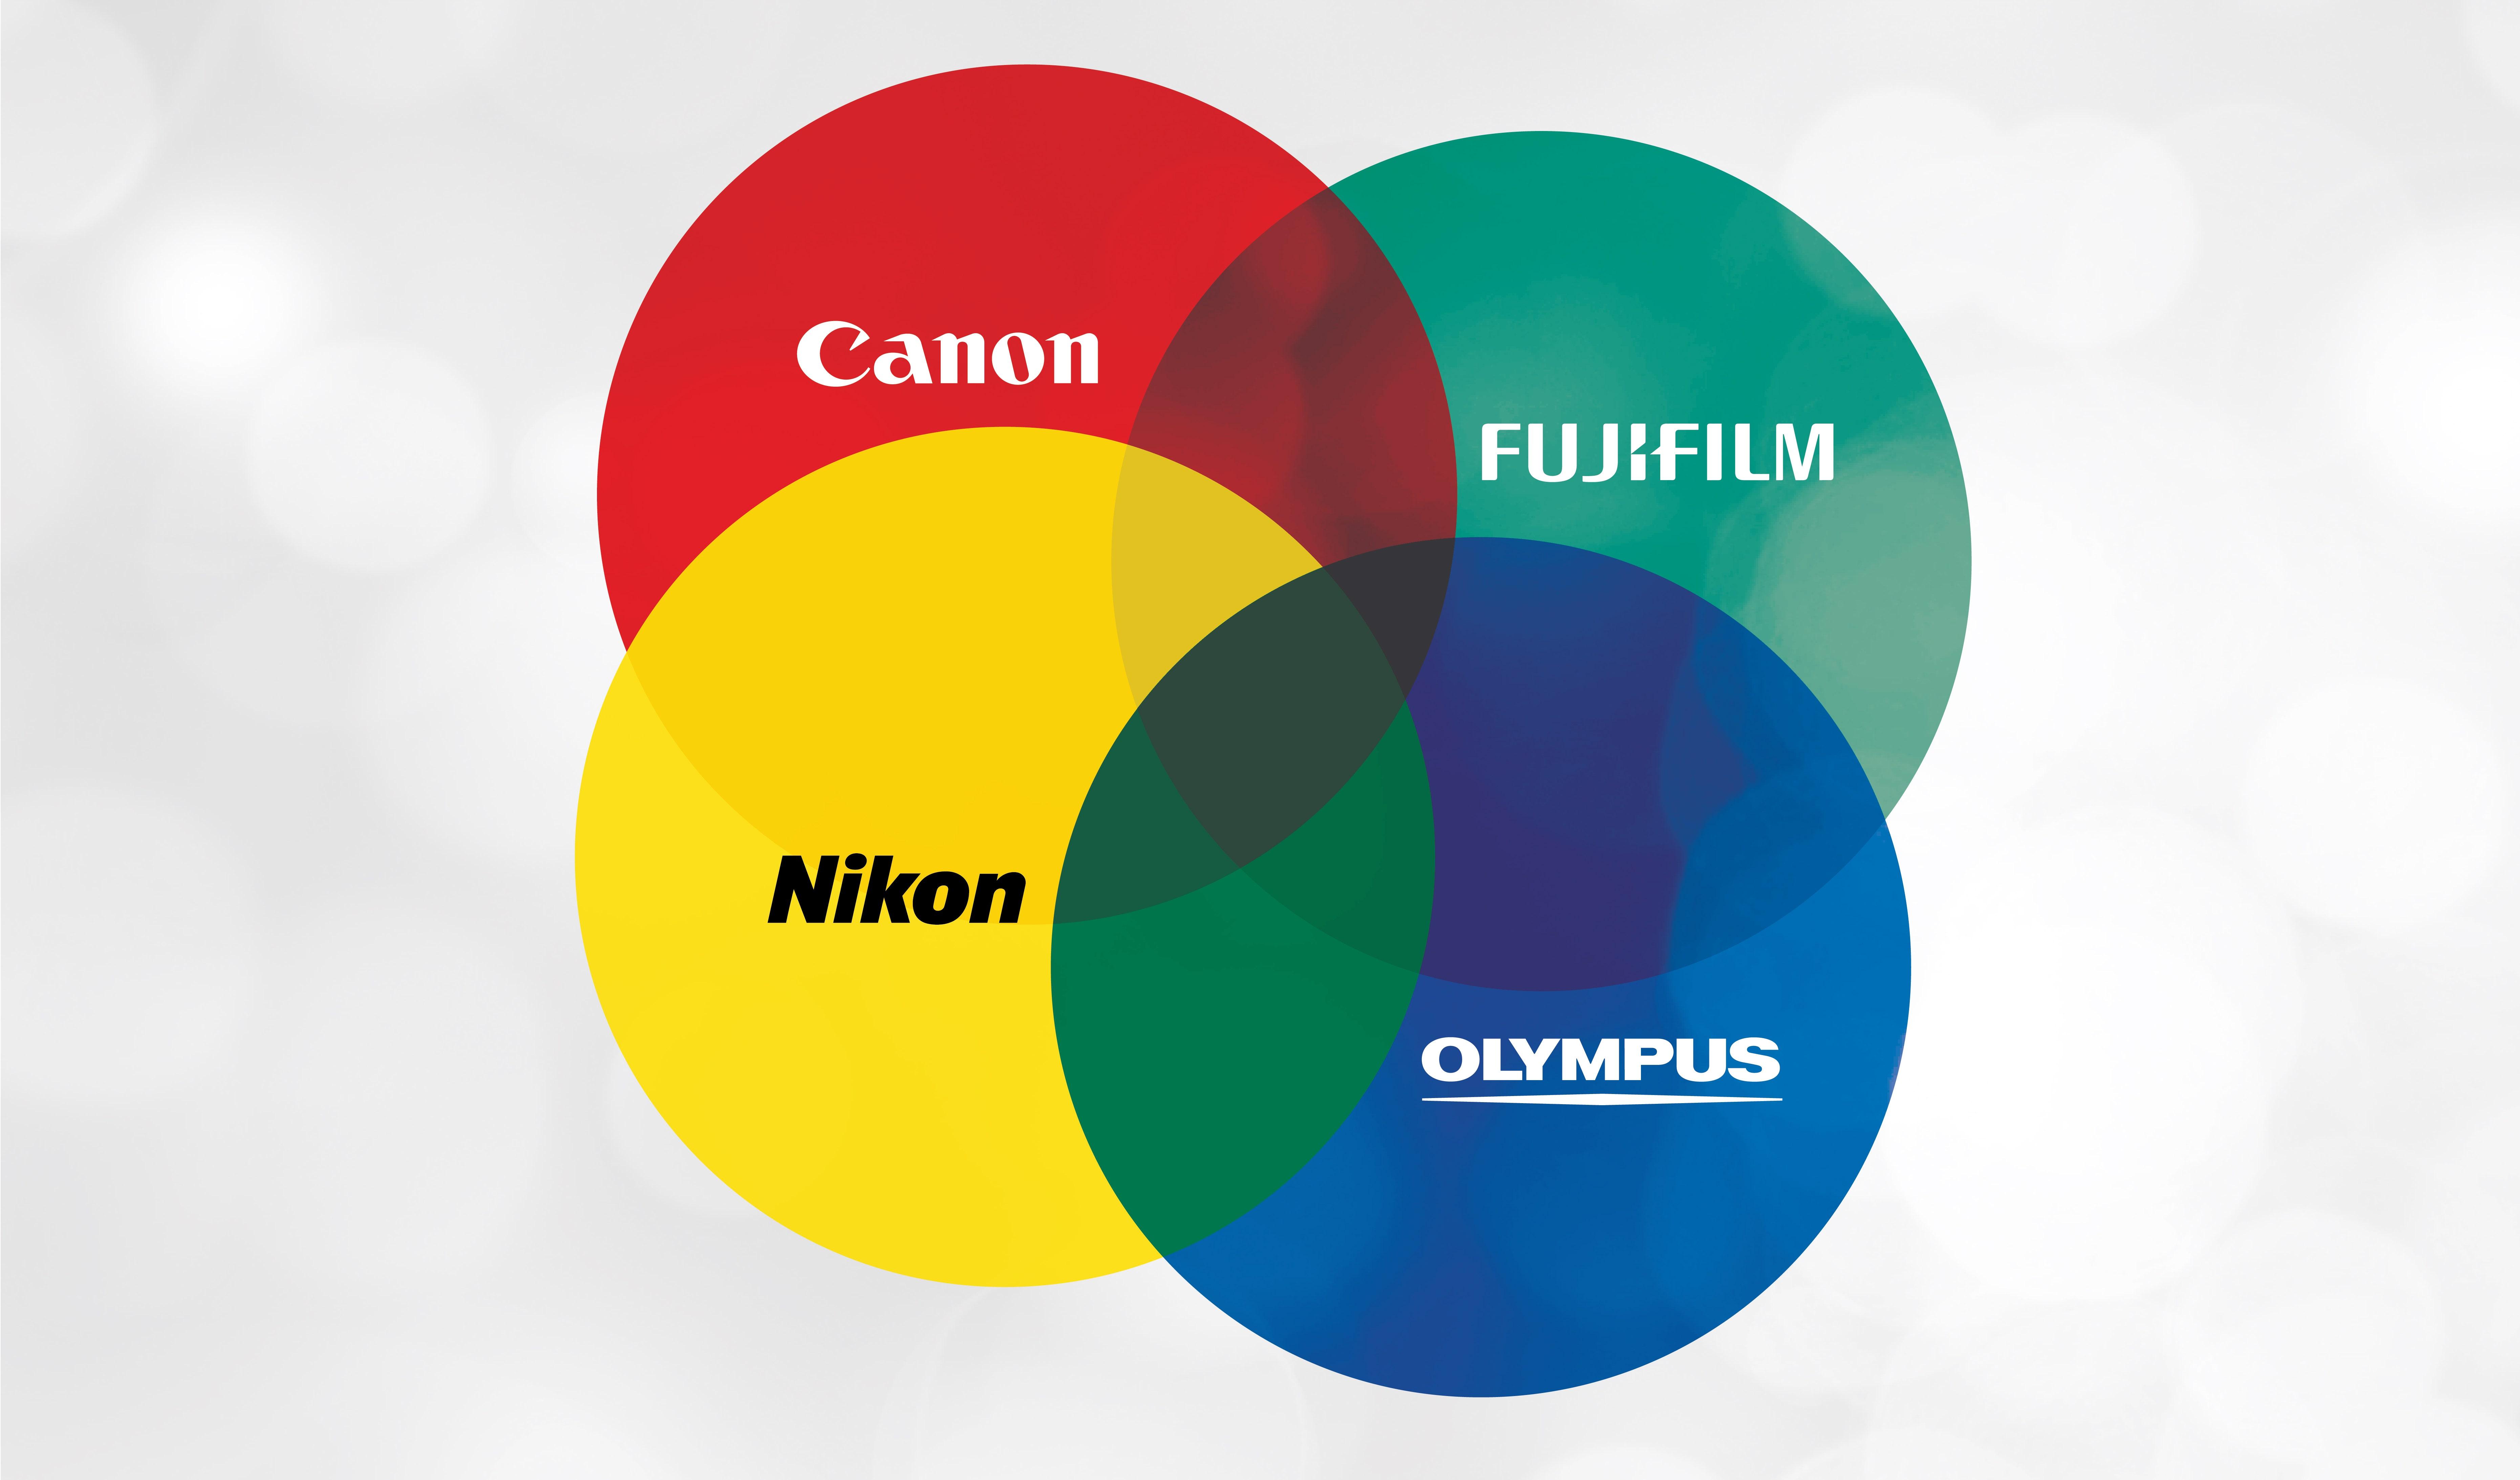 The Major Strengths of Each Camera Brand